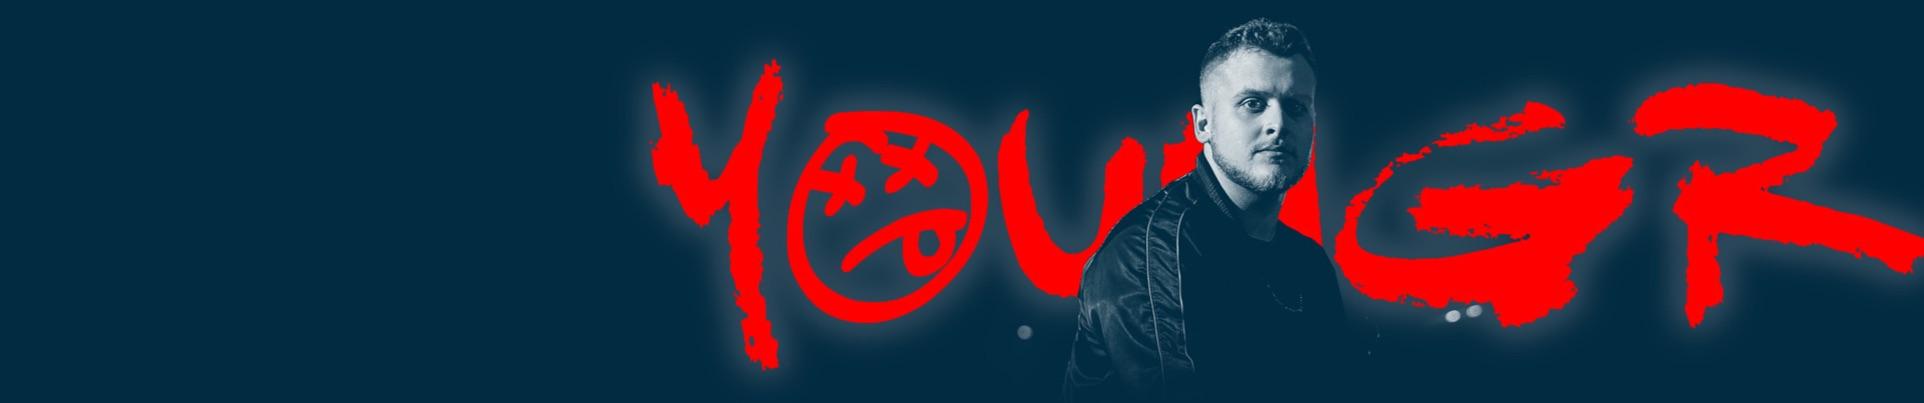 BRUNO MARTINI RELEASES 'YOUNGR' (FEAT. SHAUN JACOBS), PRODUCED BY MARTINI & TIMBALAND ile ilgili görsel sonucu